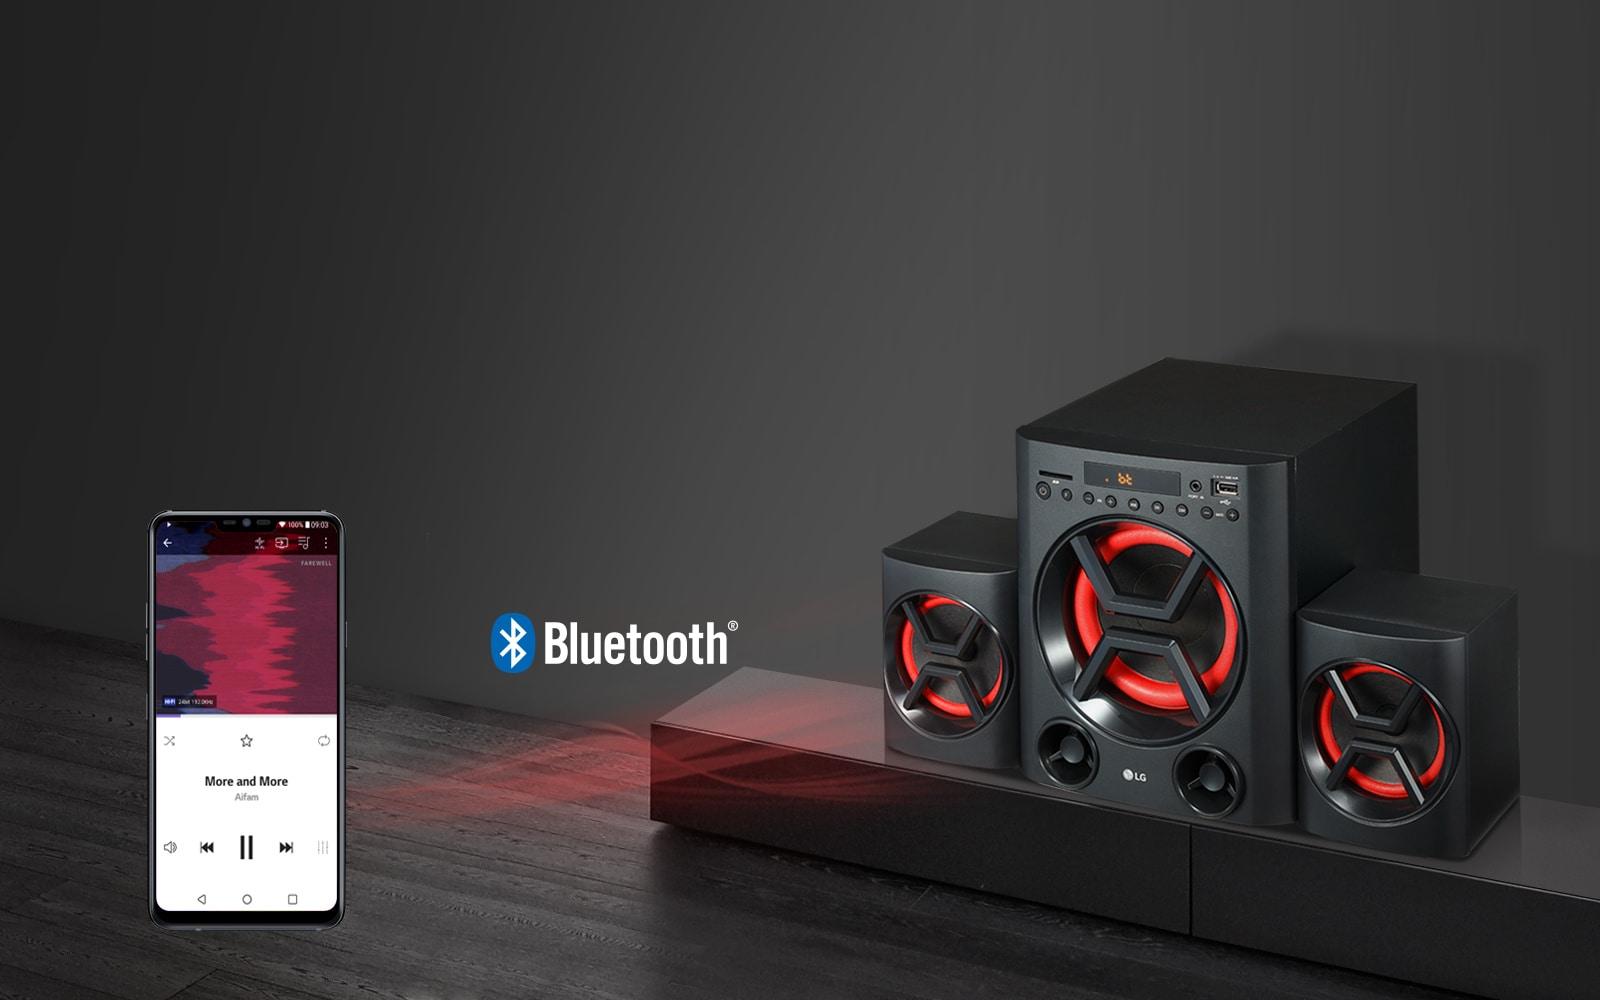 Wireless Audio Streaming via Bluetooth1